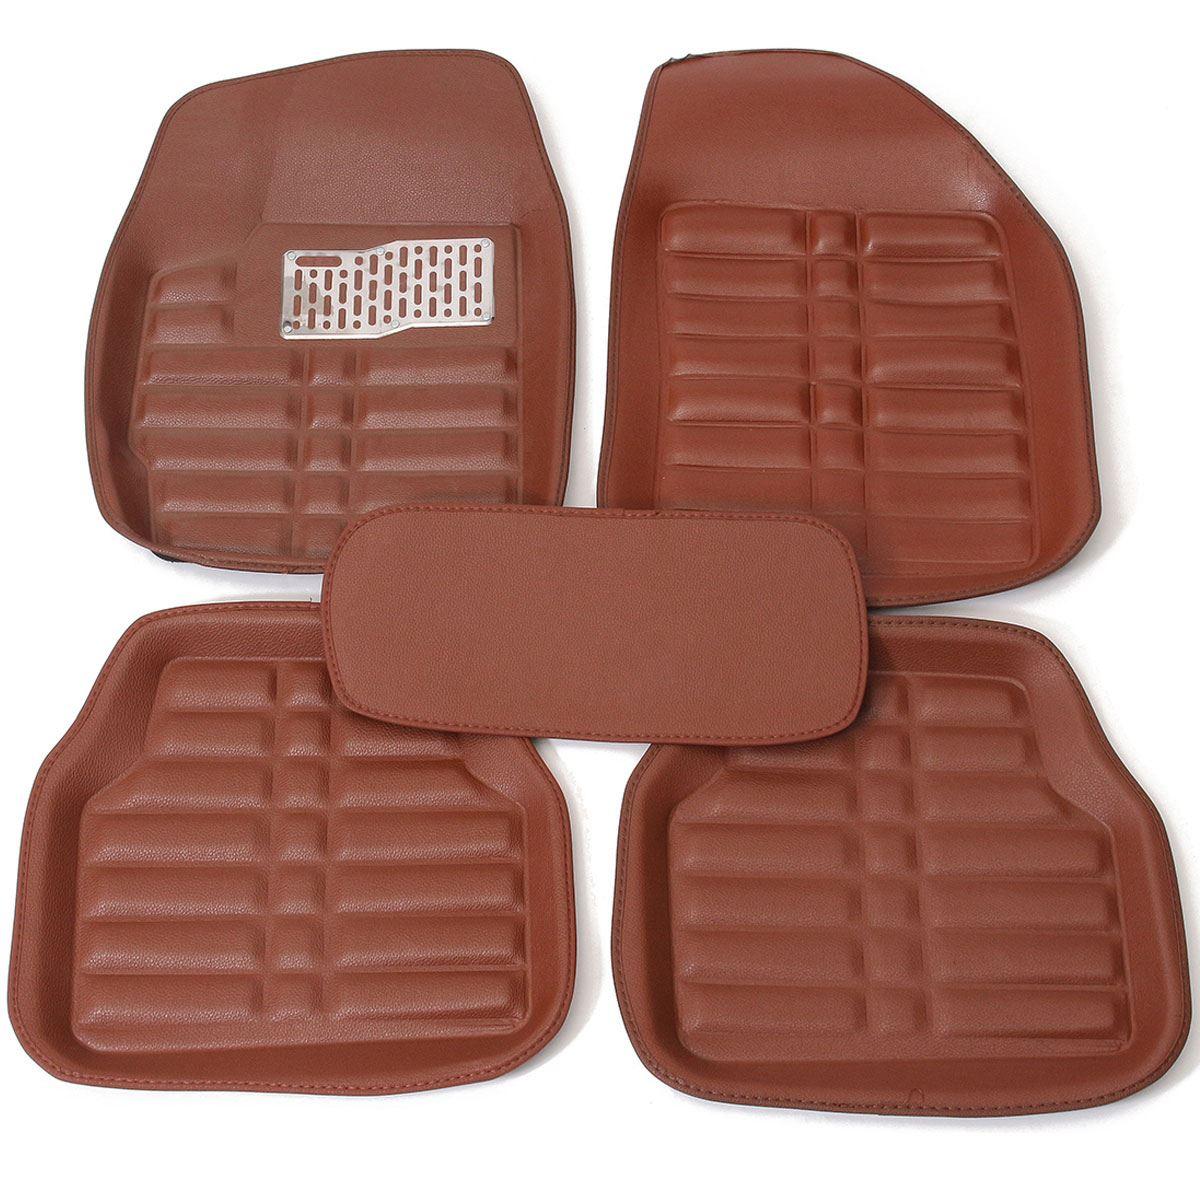 5pc universal car floor mats front rear liner waterproof for Auto flooring